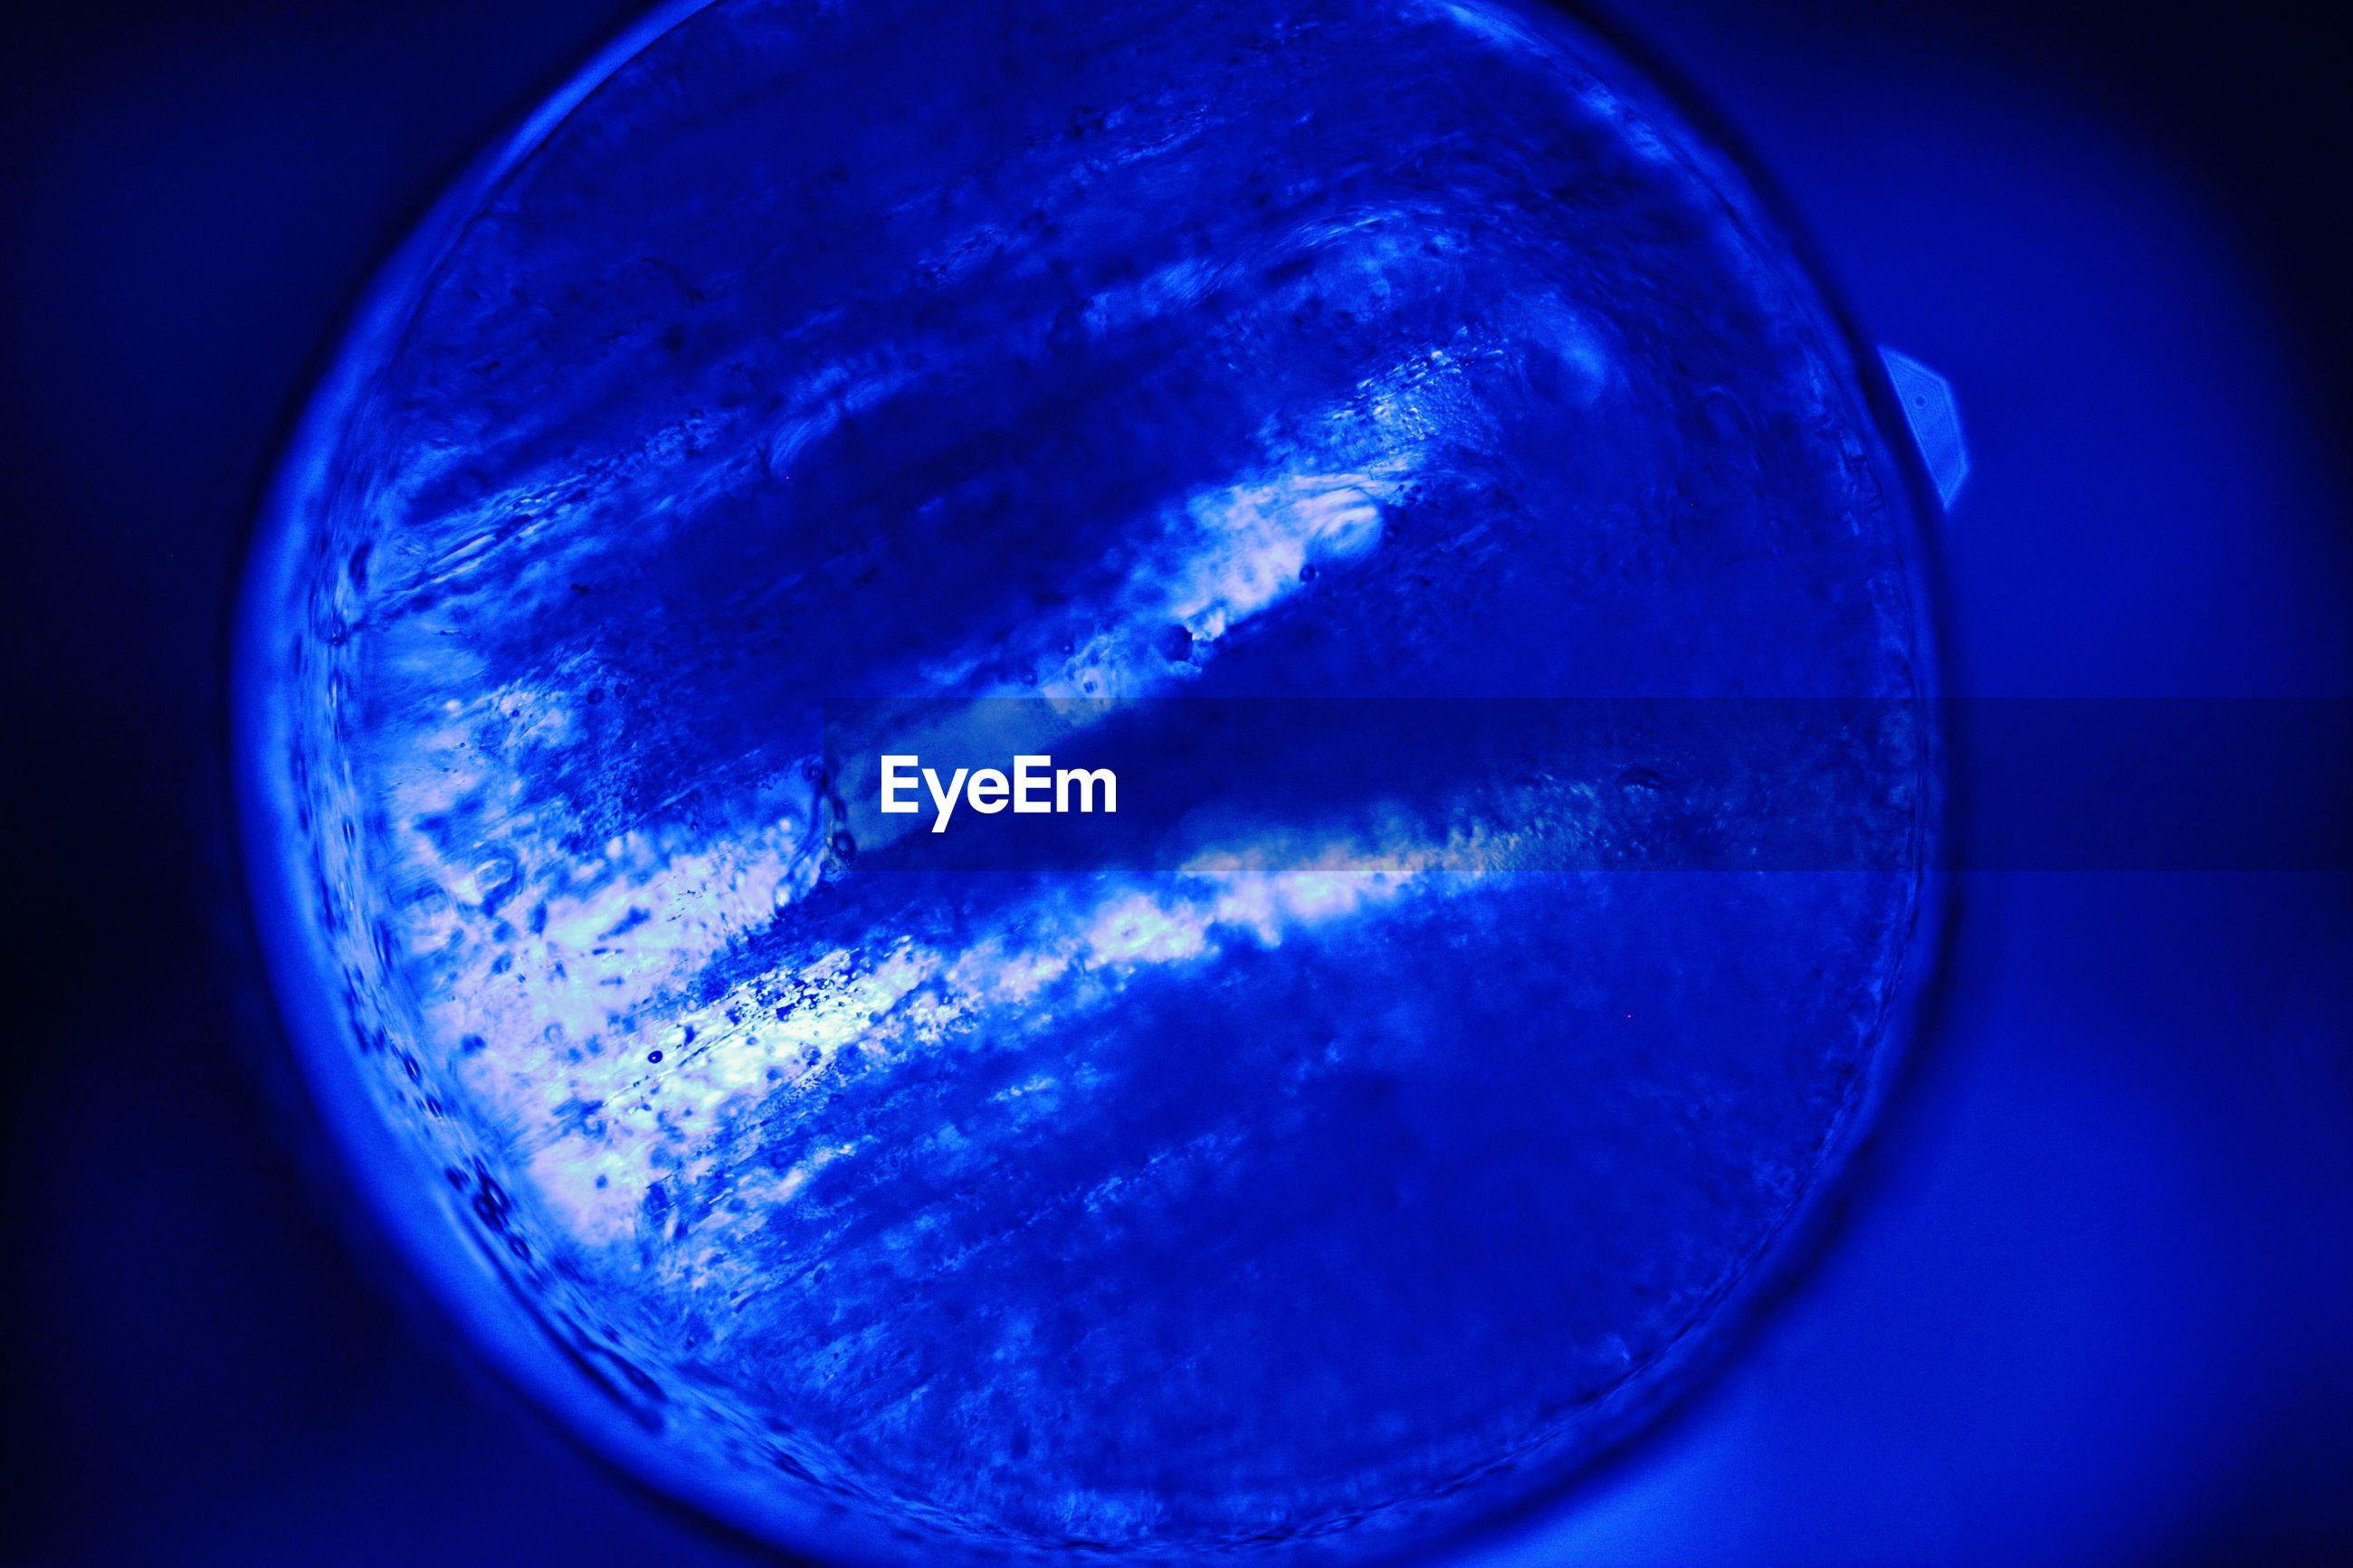 Close-up of blue glass